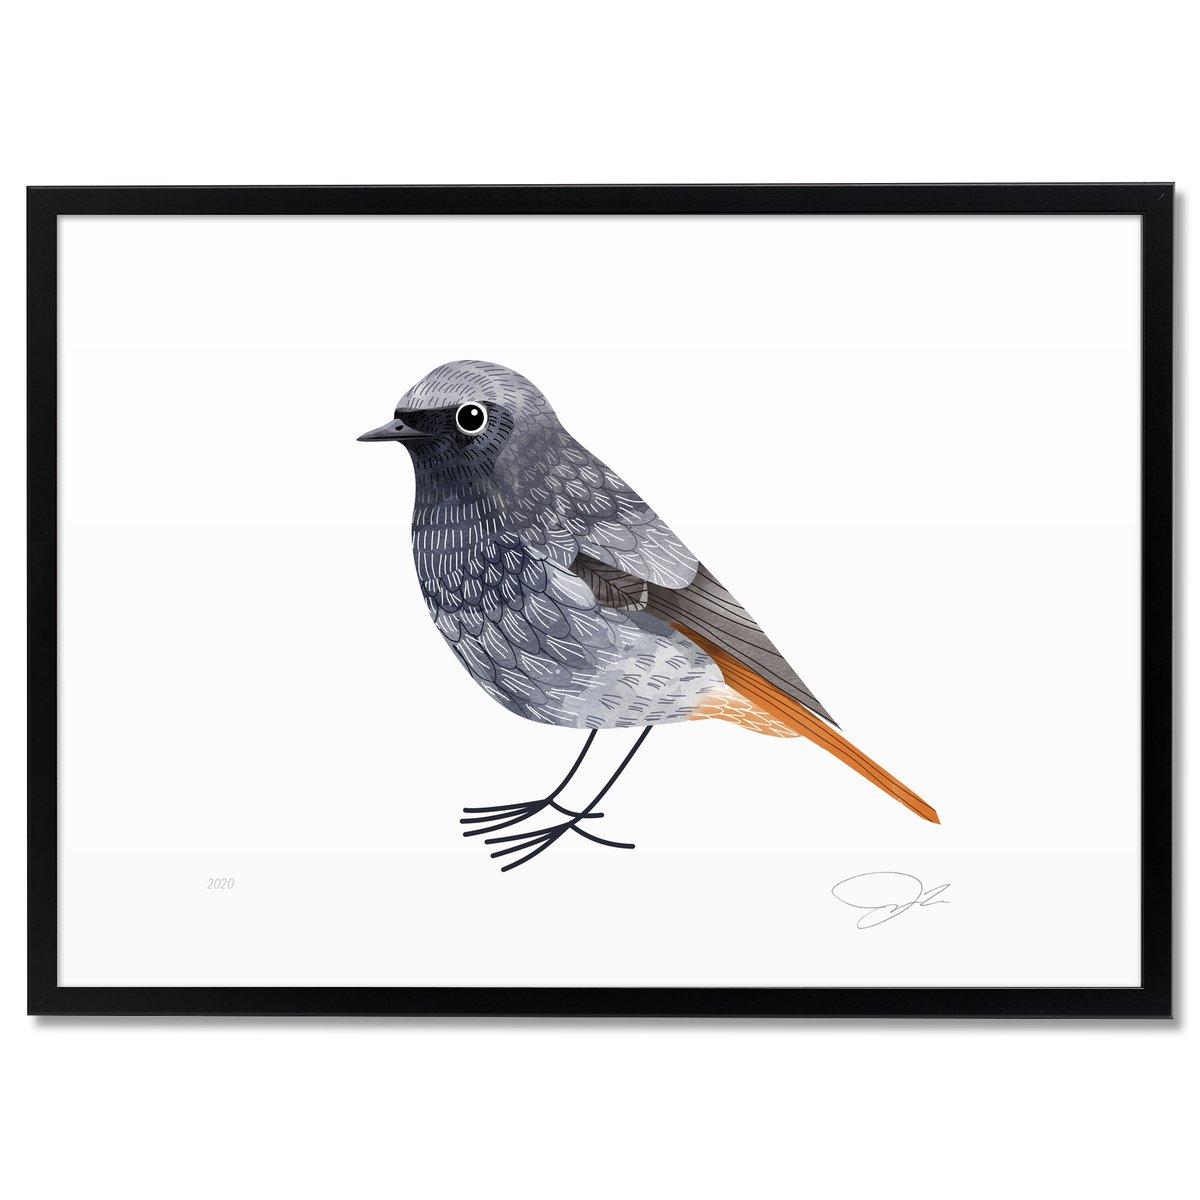 Image of Print: Redstart (Rotschwanz)